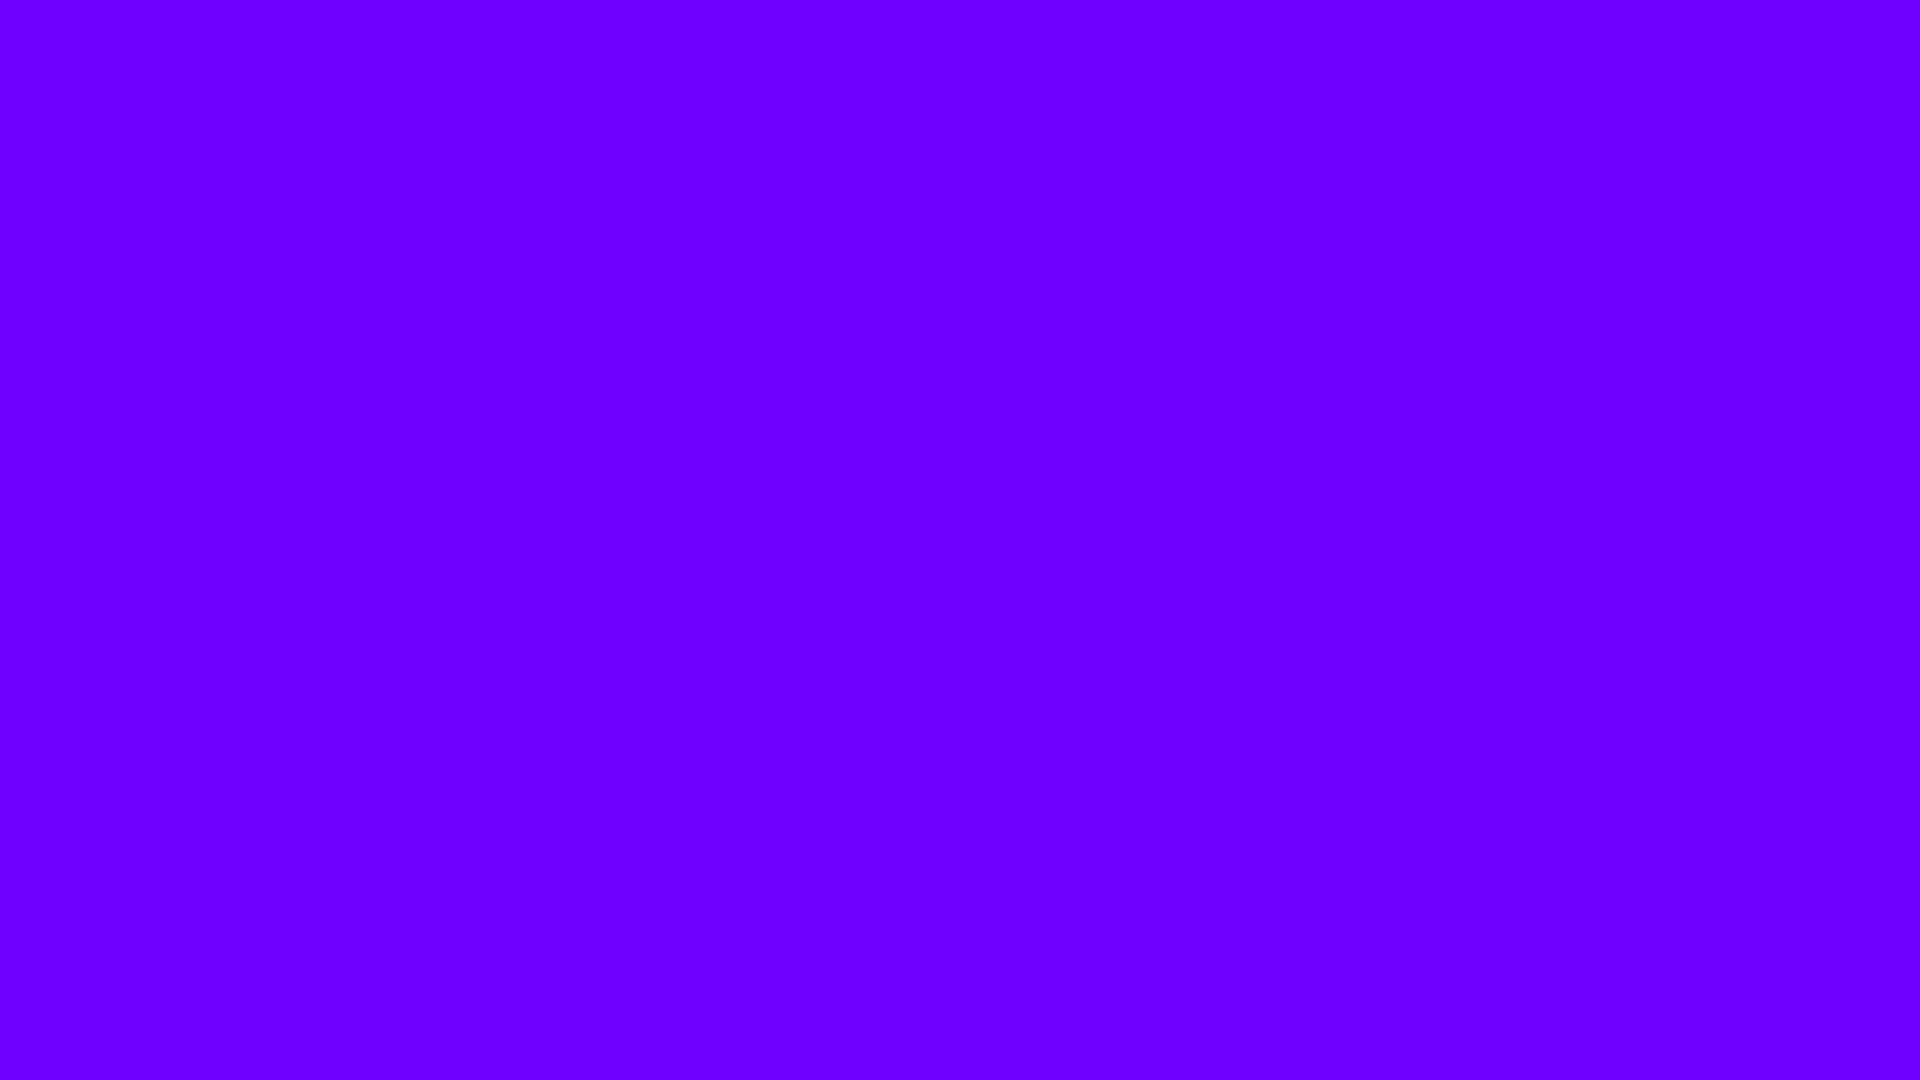 1920x1080 Electric Indigo Solid Color Background